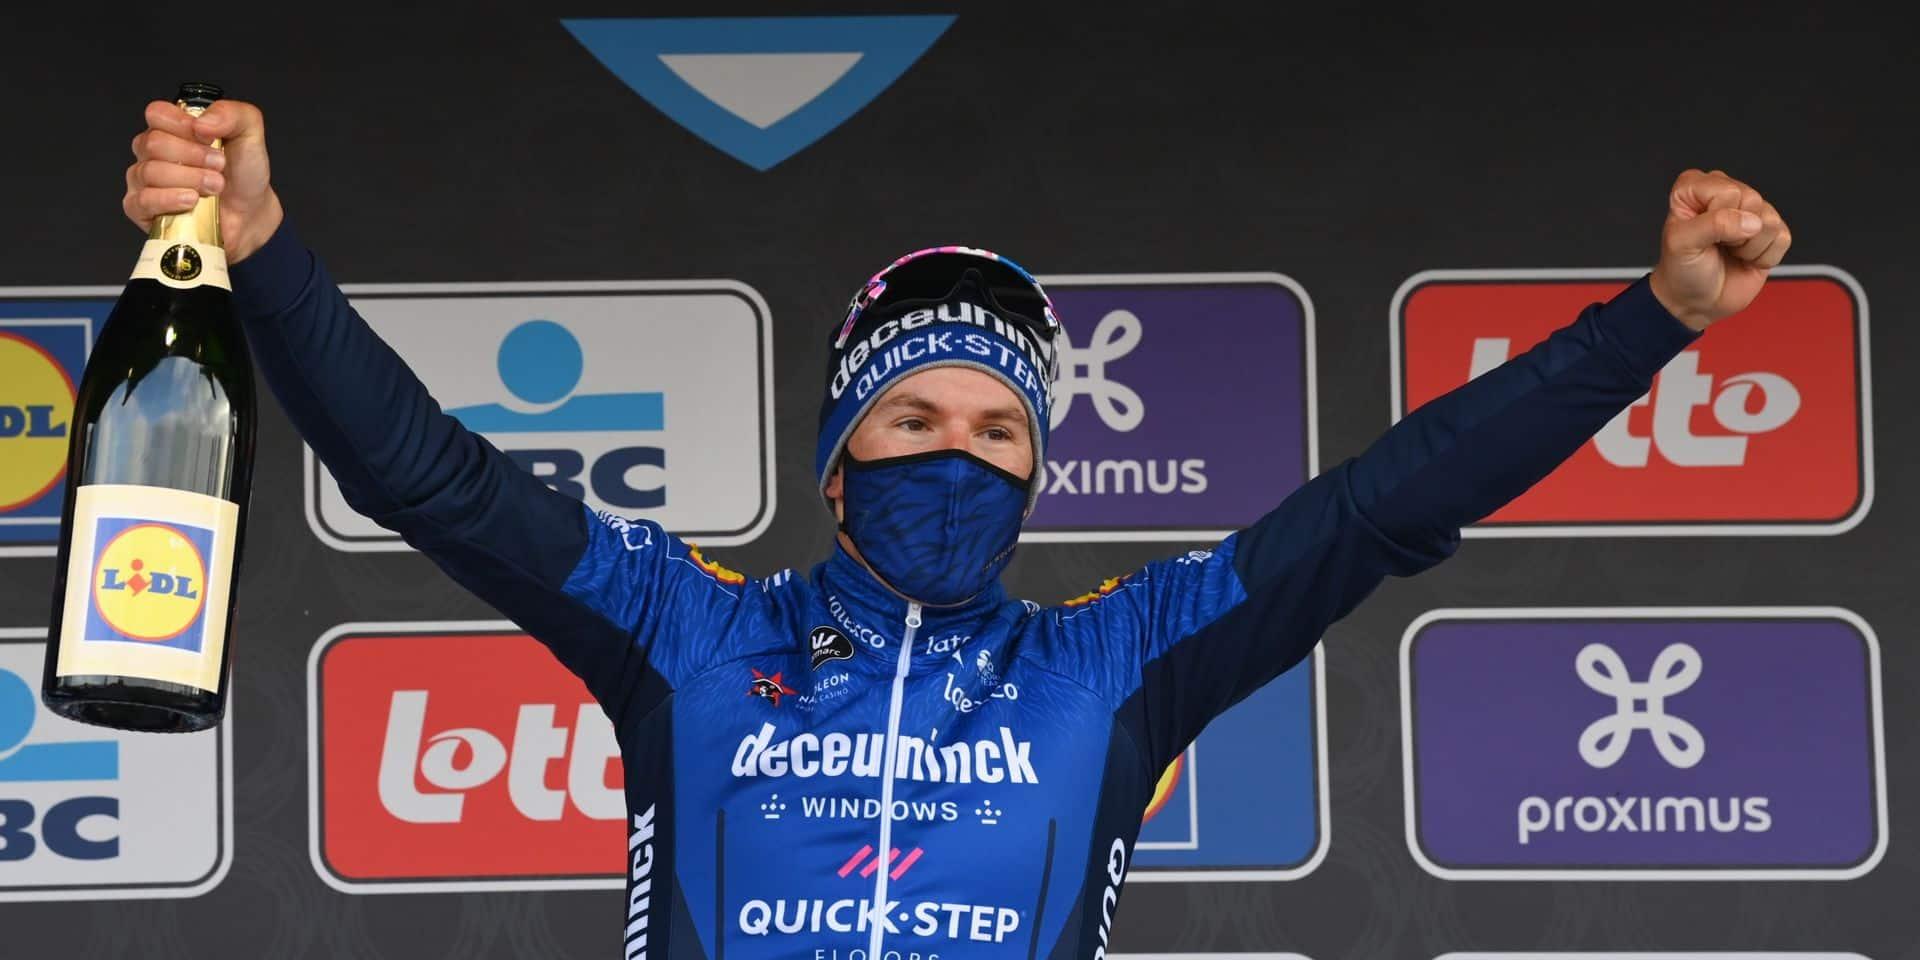 Circuit Het Nieuwsblad: victoire pour Davide Ballerini au sprint !